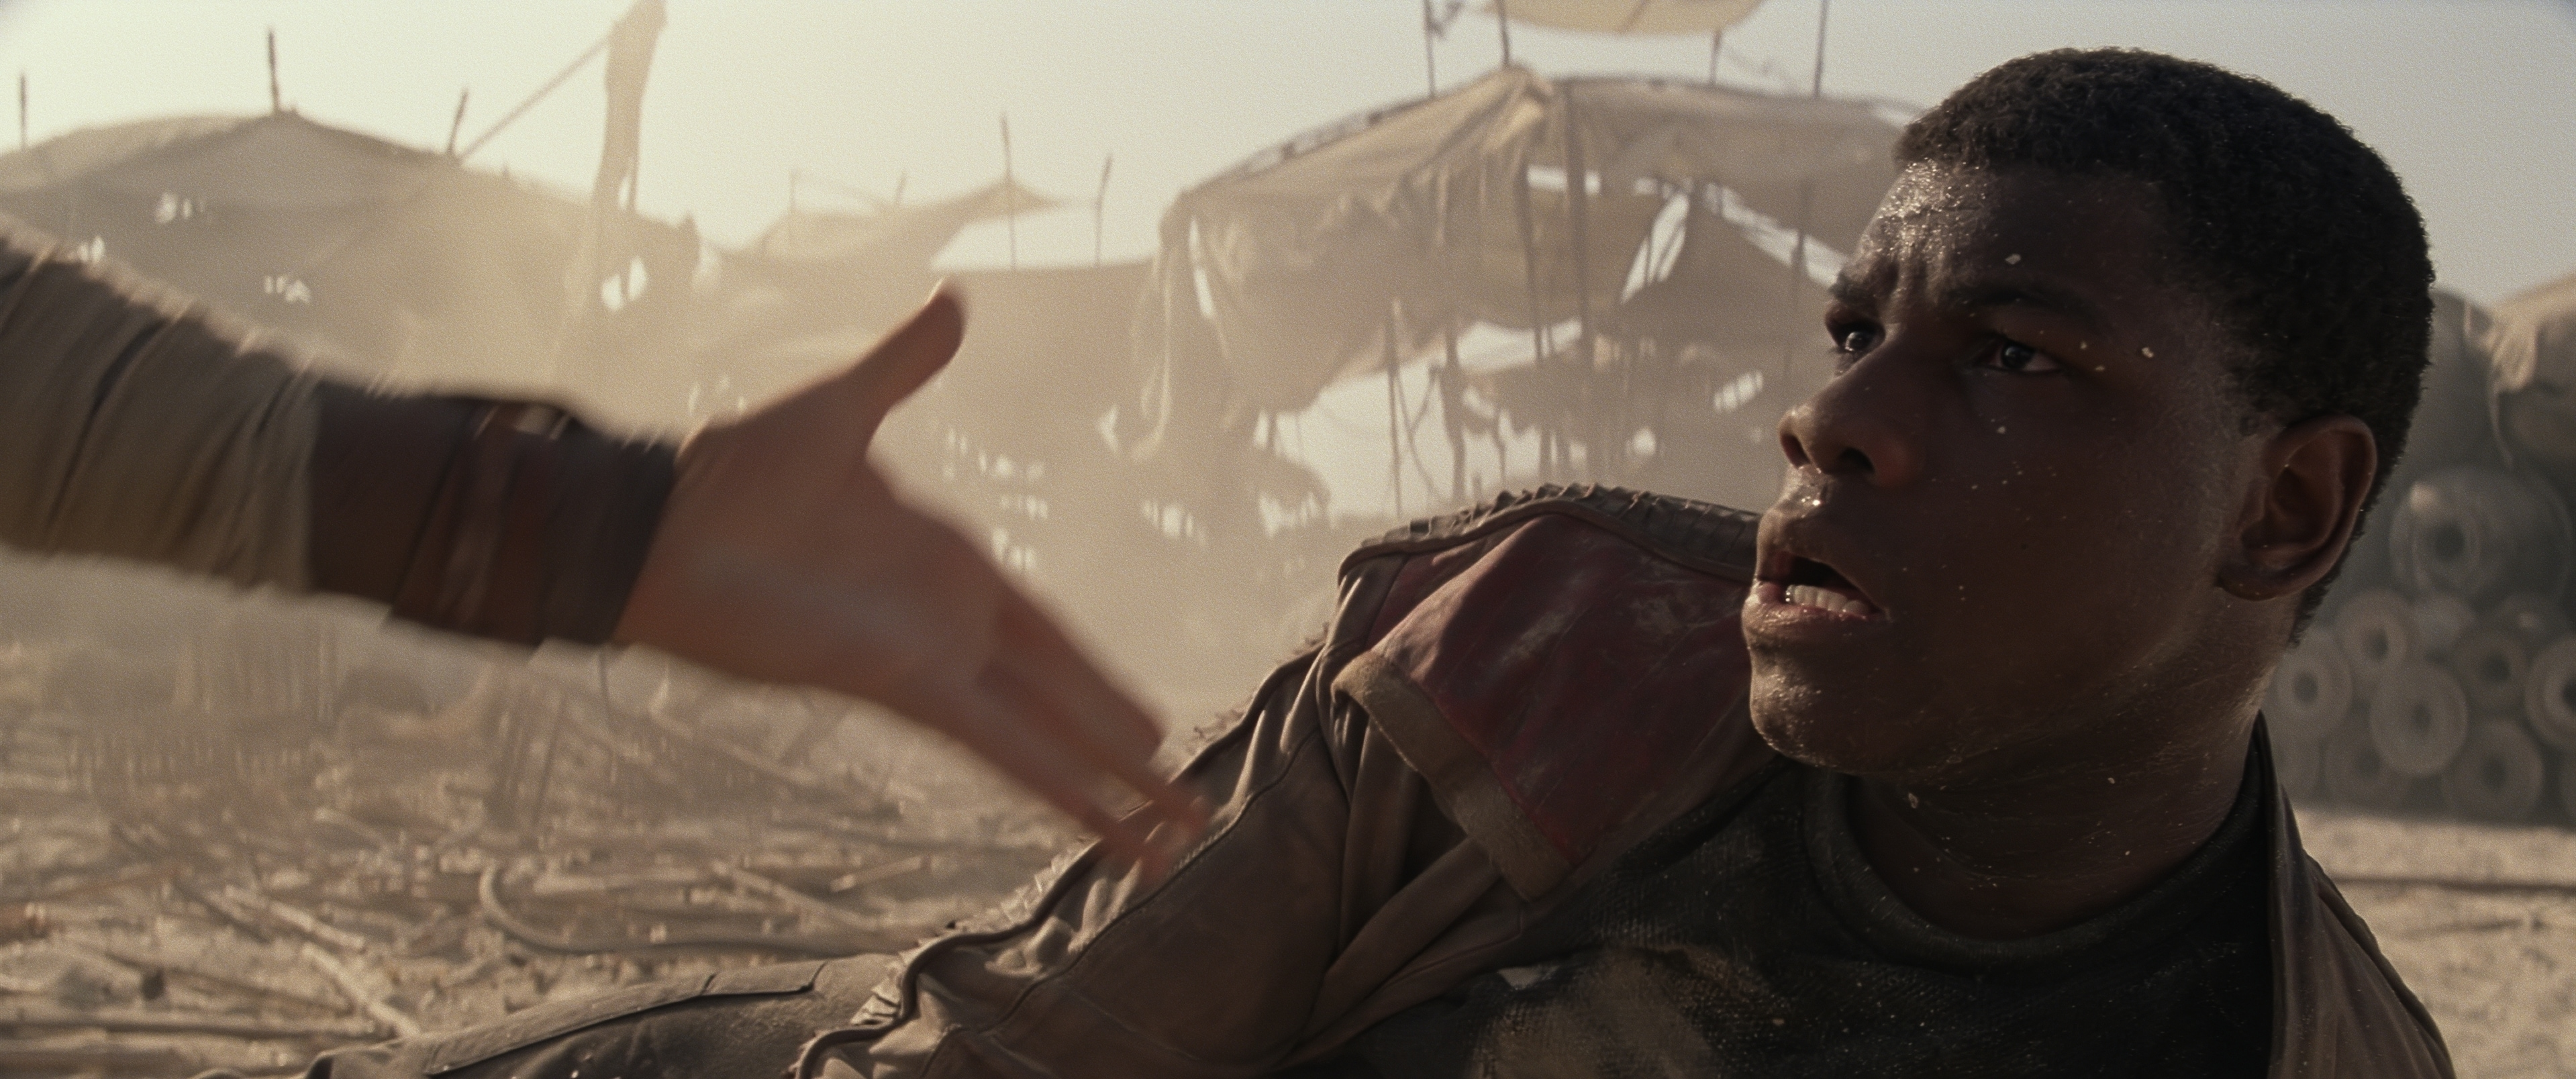 Rey played by Daisy Ridley helps Finn played by John Boyega  on Jakku.